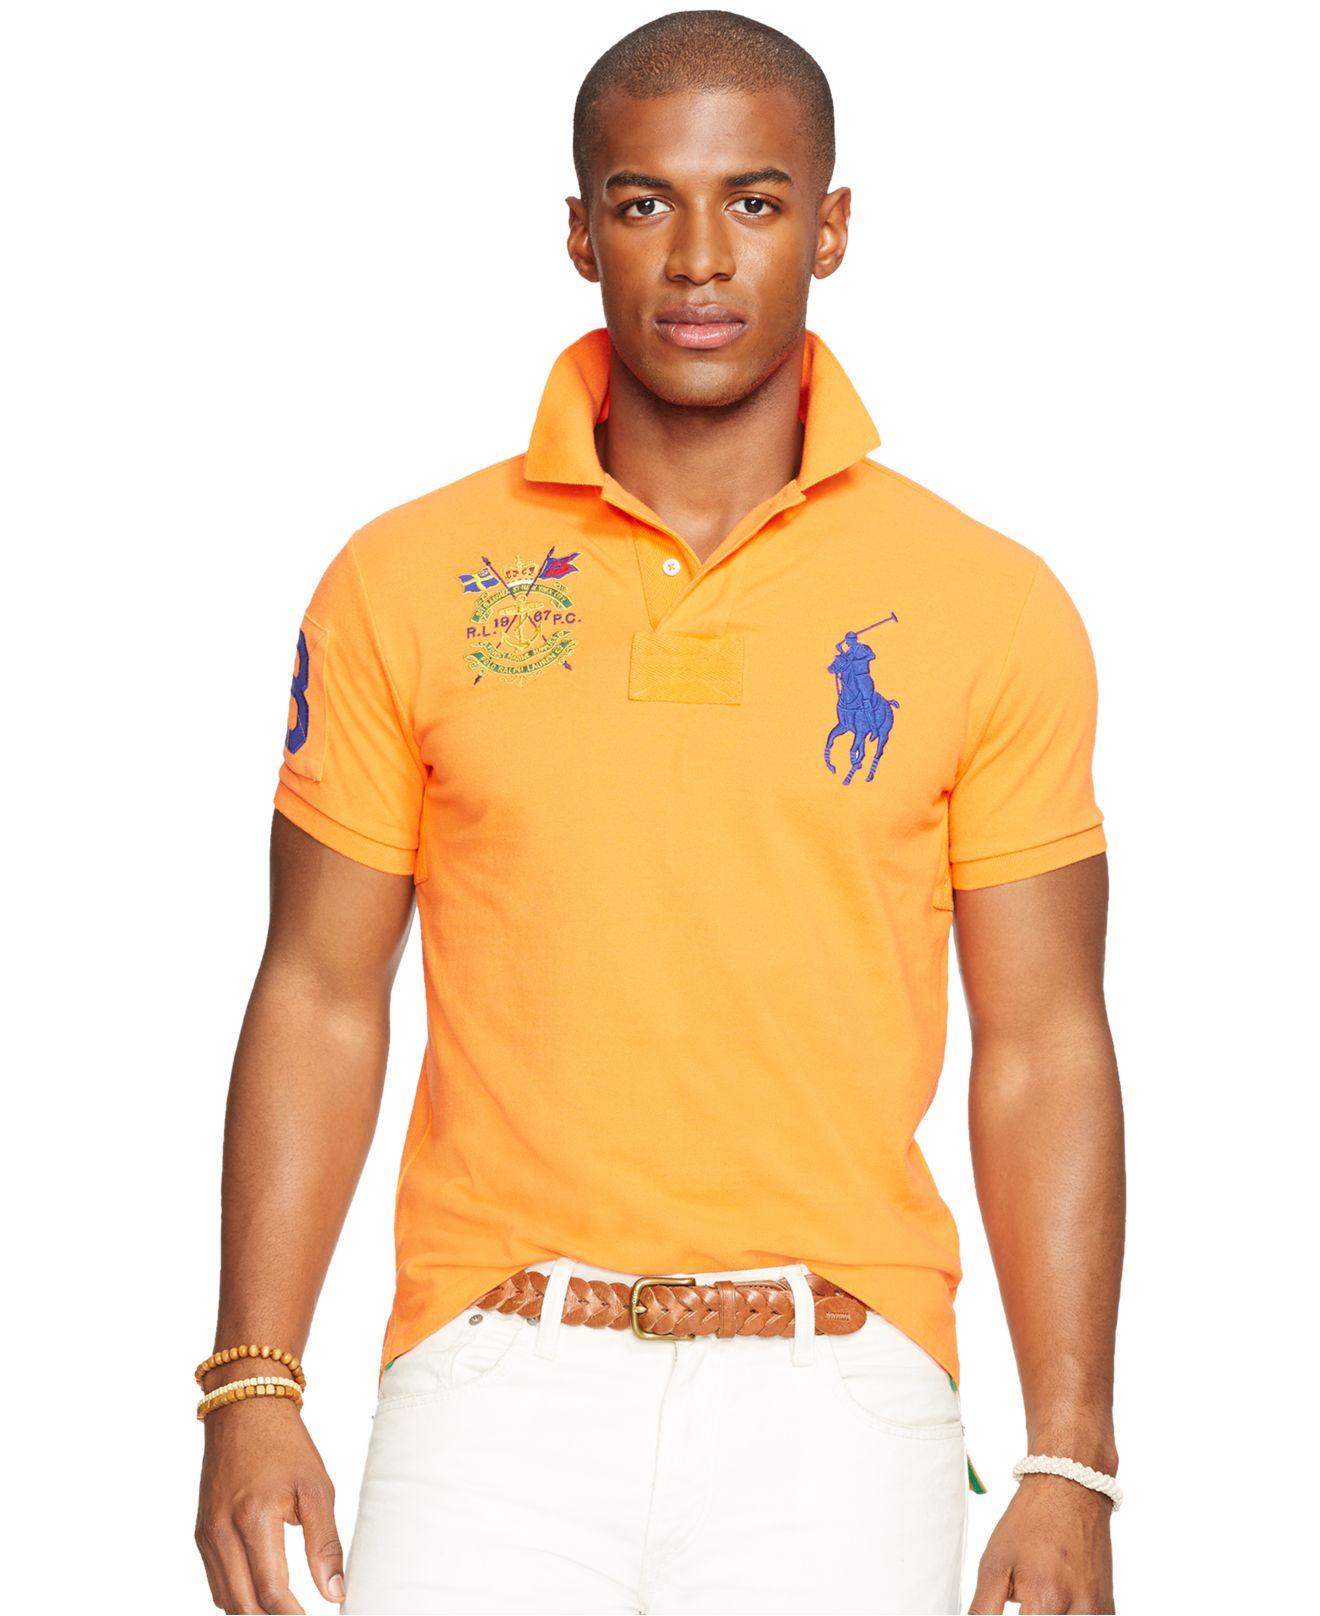 Polo ralph lauren custom fit big pony mesh polo shirt in for Polo ralph lauren custom fit polo shirt